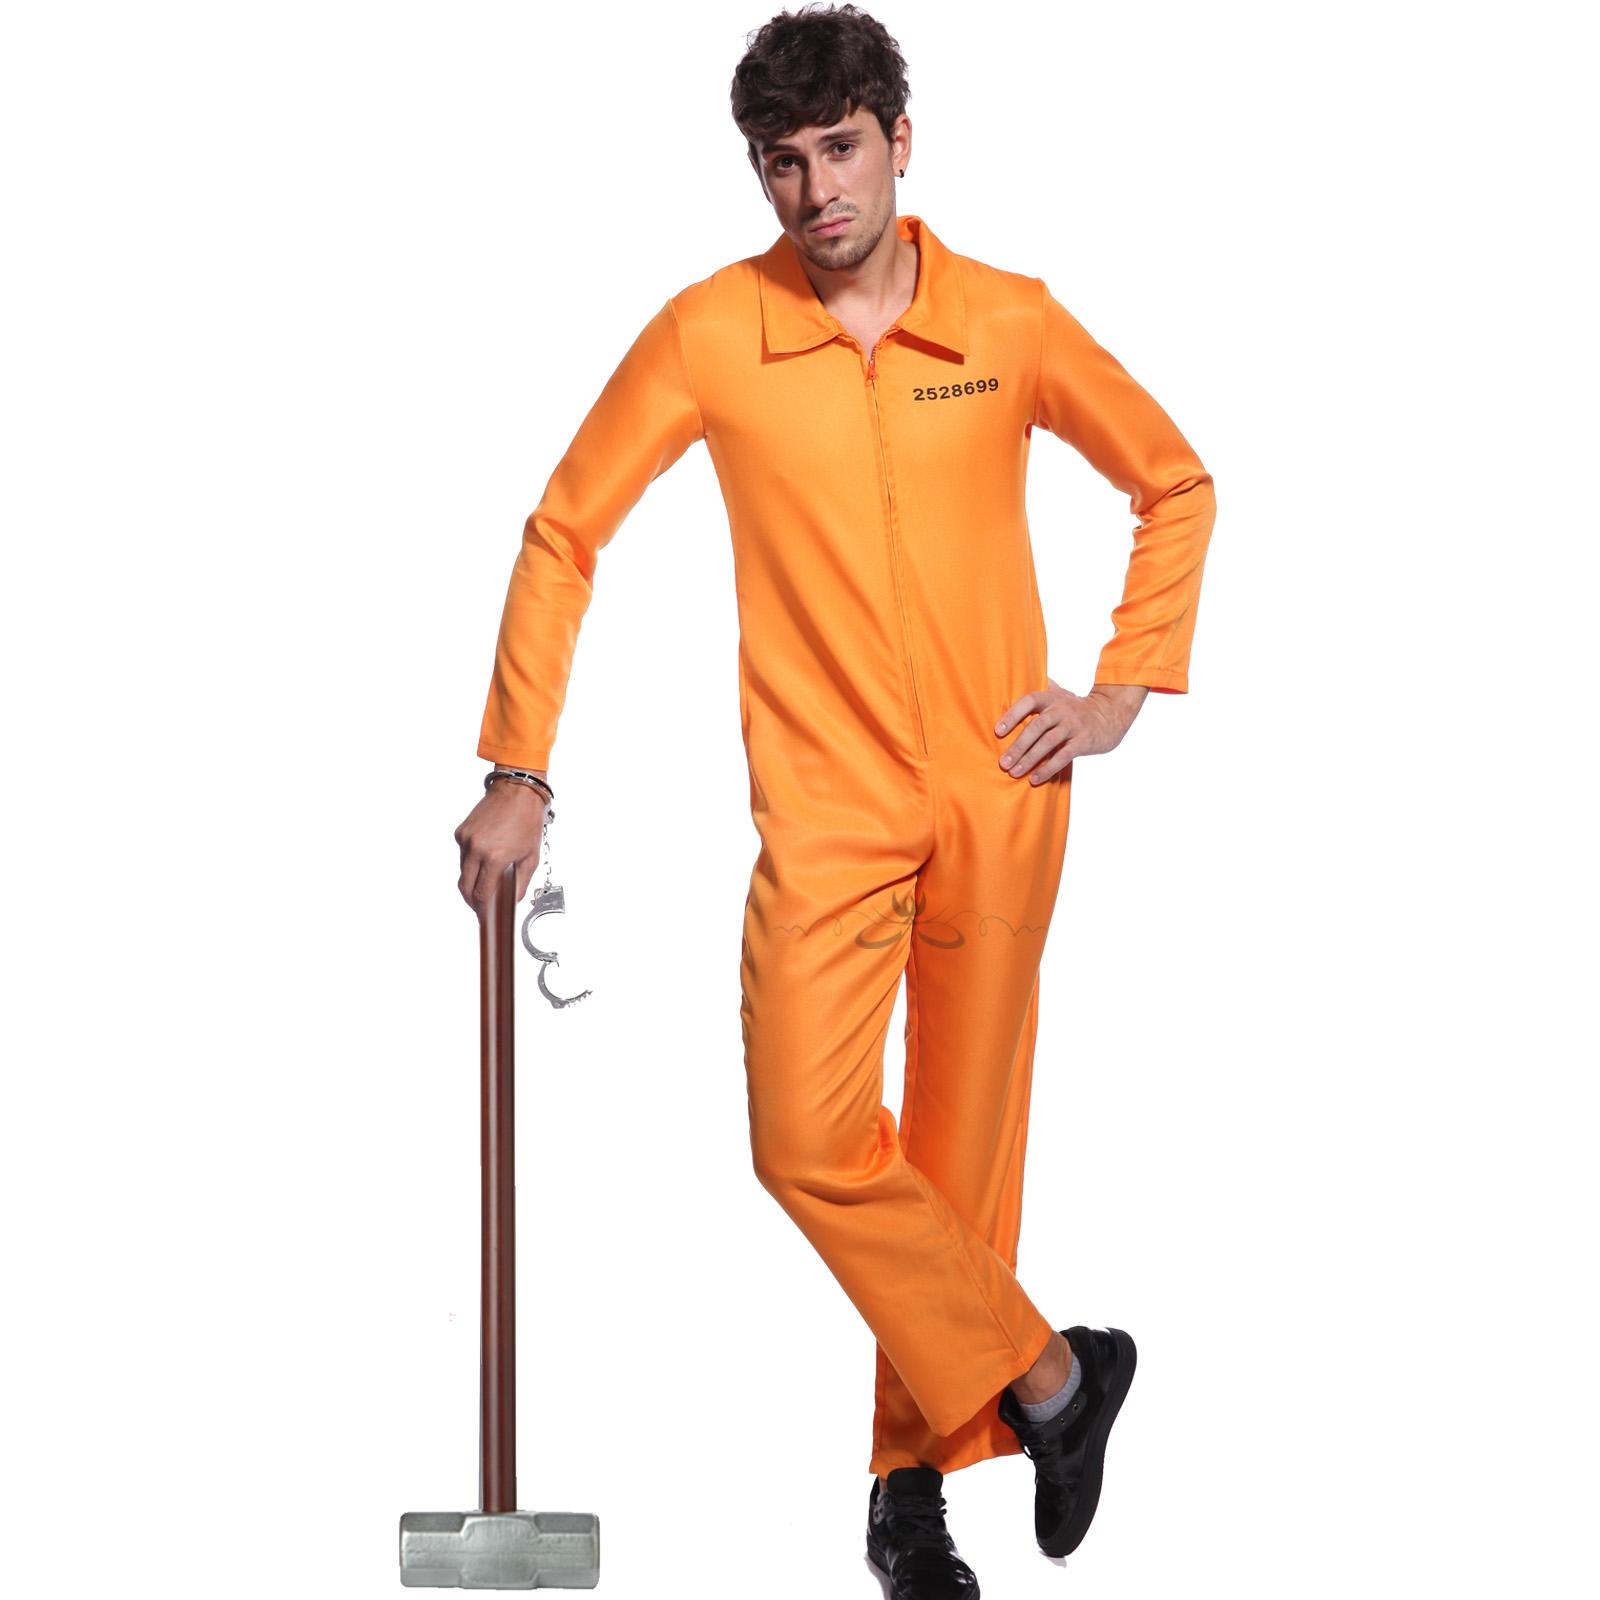 Orange PRISONER JUMPSUIT BOILER SUIT CONVICT Fancy Dress Costume ...